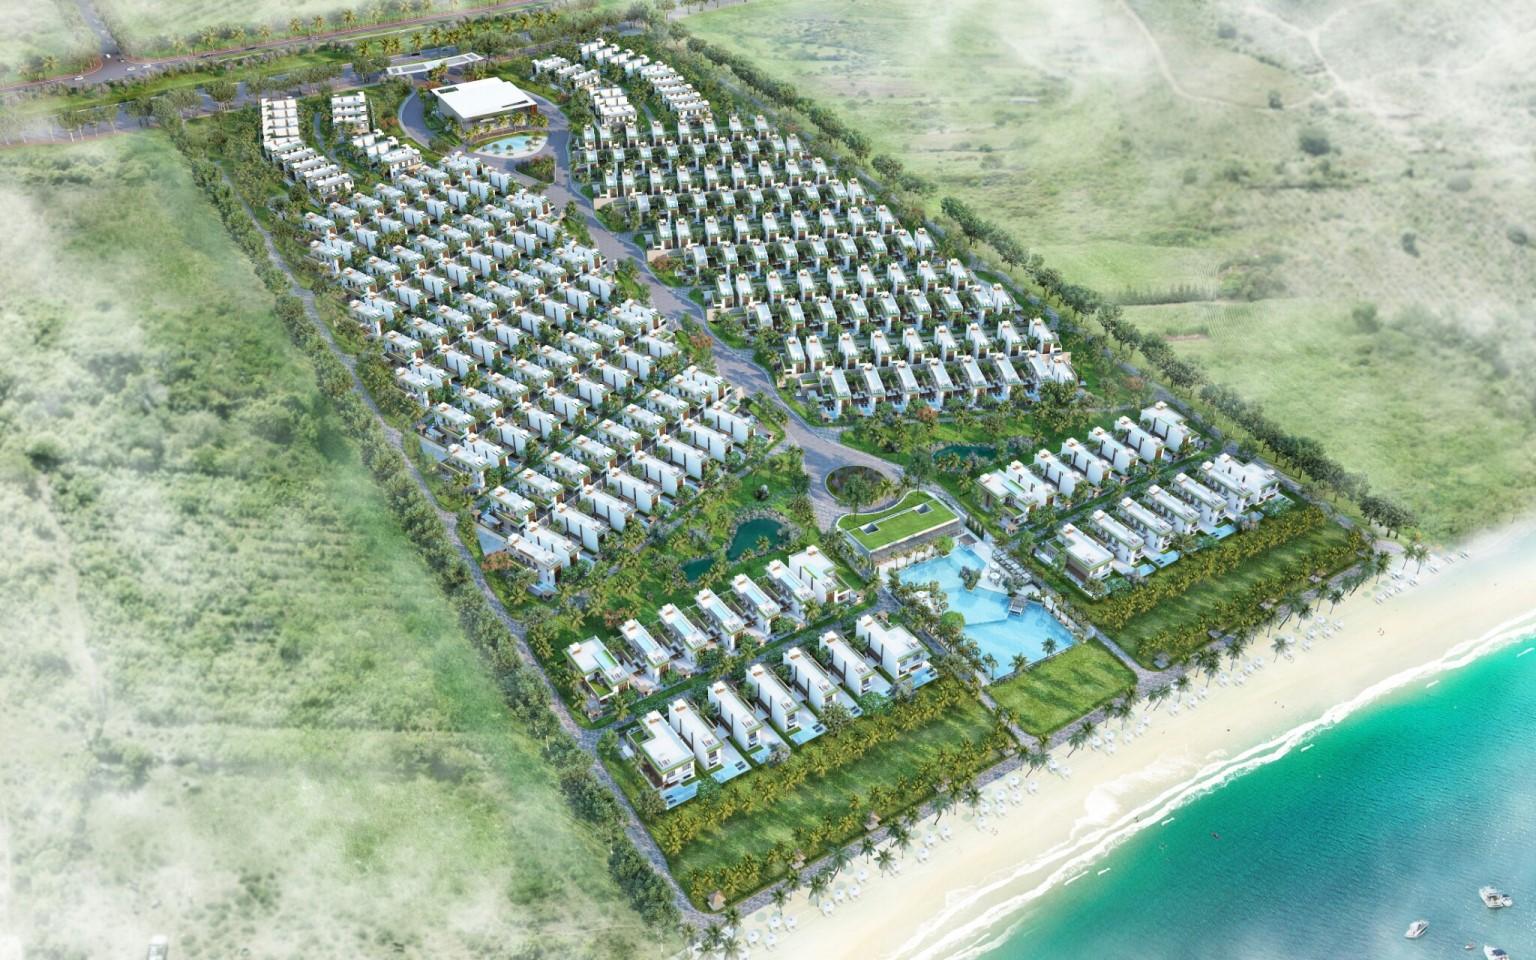 http://camranhmysteryvillas.net/wp-content/uploads/2017/04/Mat-bang-thiet-ke-Cam-Ranh-mystery-Villas.jpg